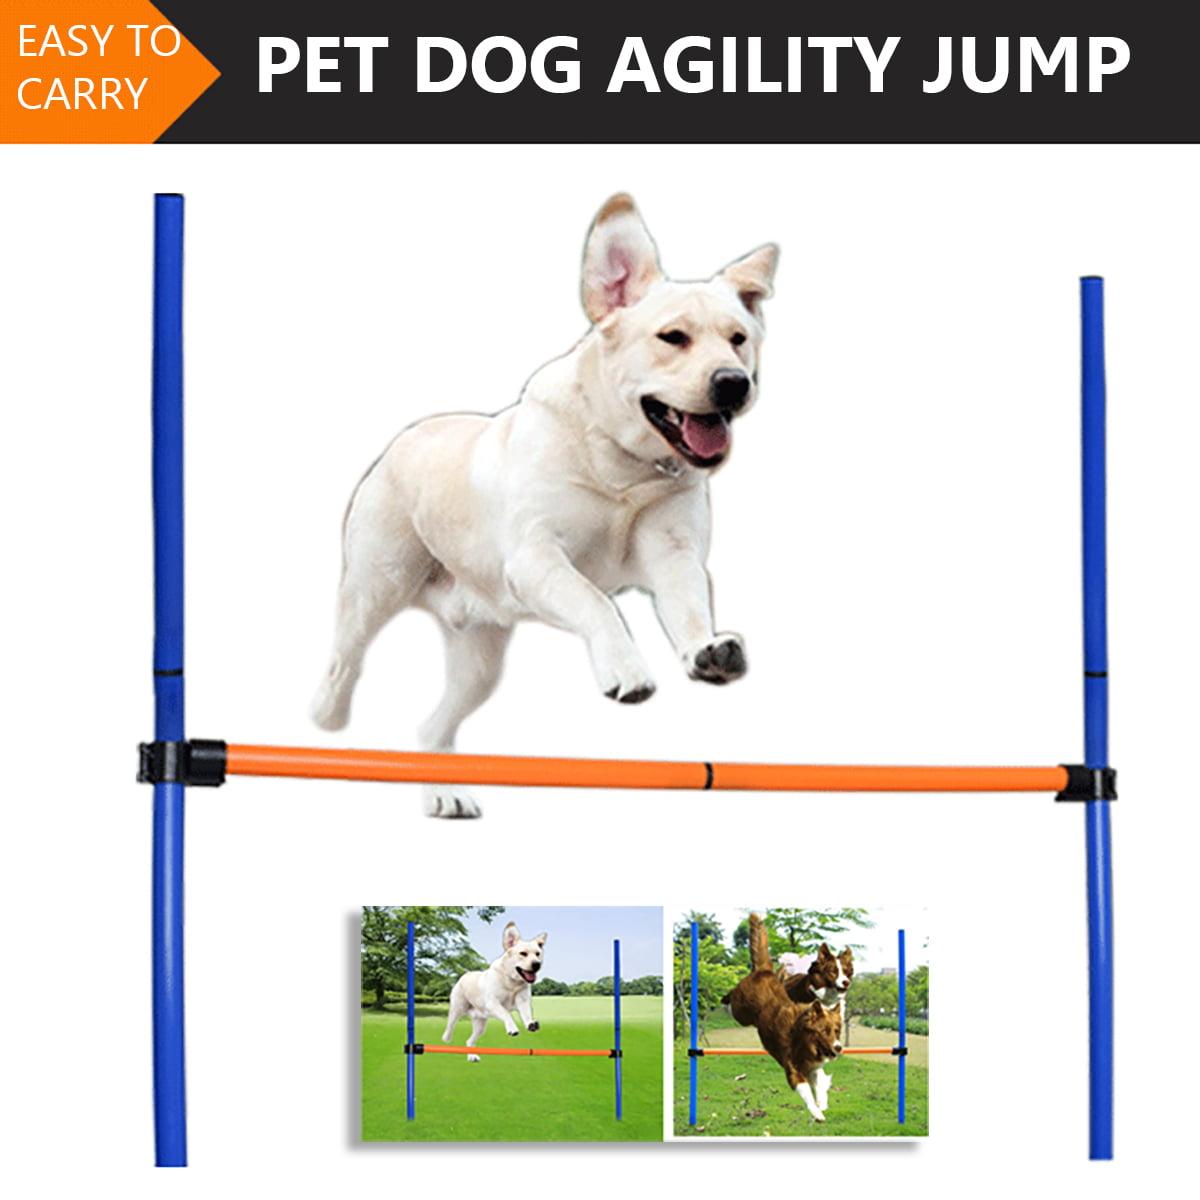 Portable Foldable Agility Training arc Hurdles Set of 5 Hurdle Jump Speed